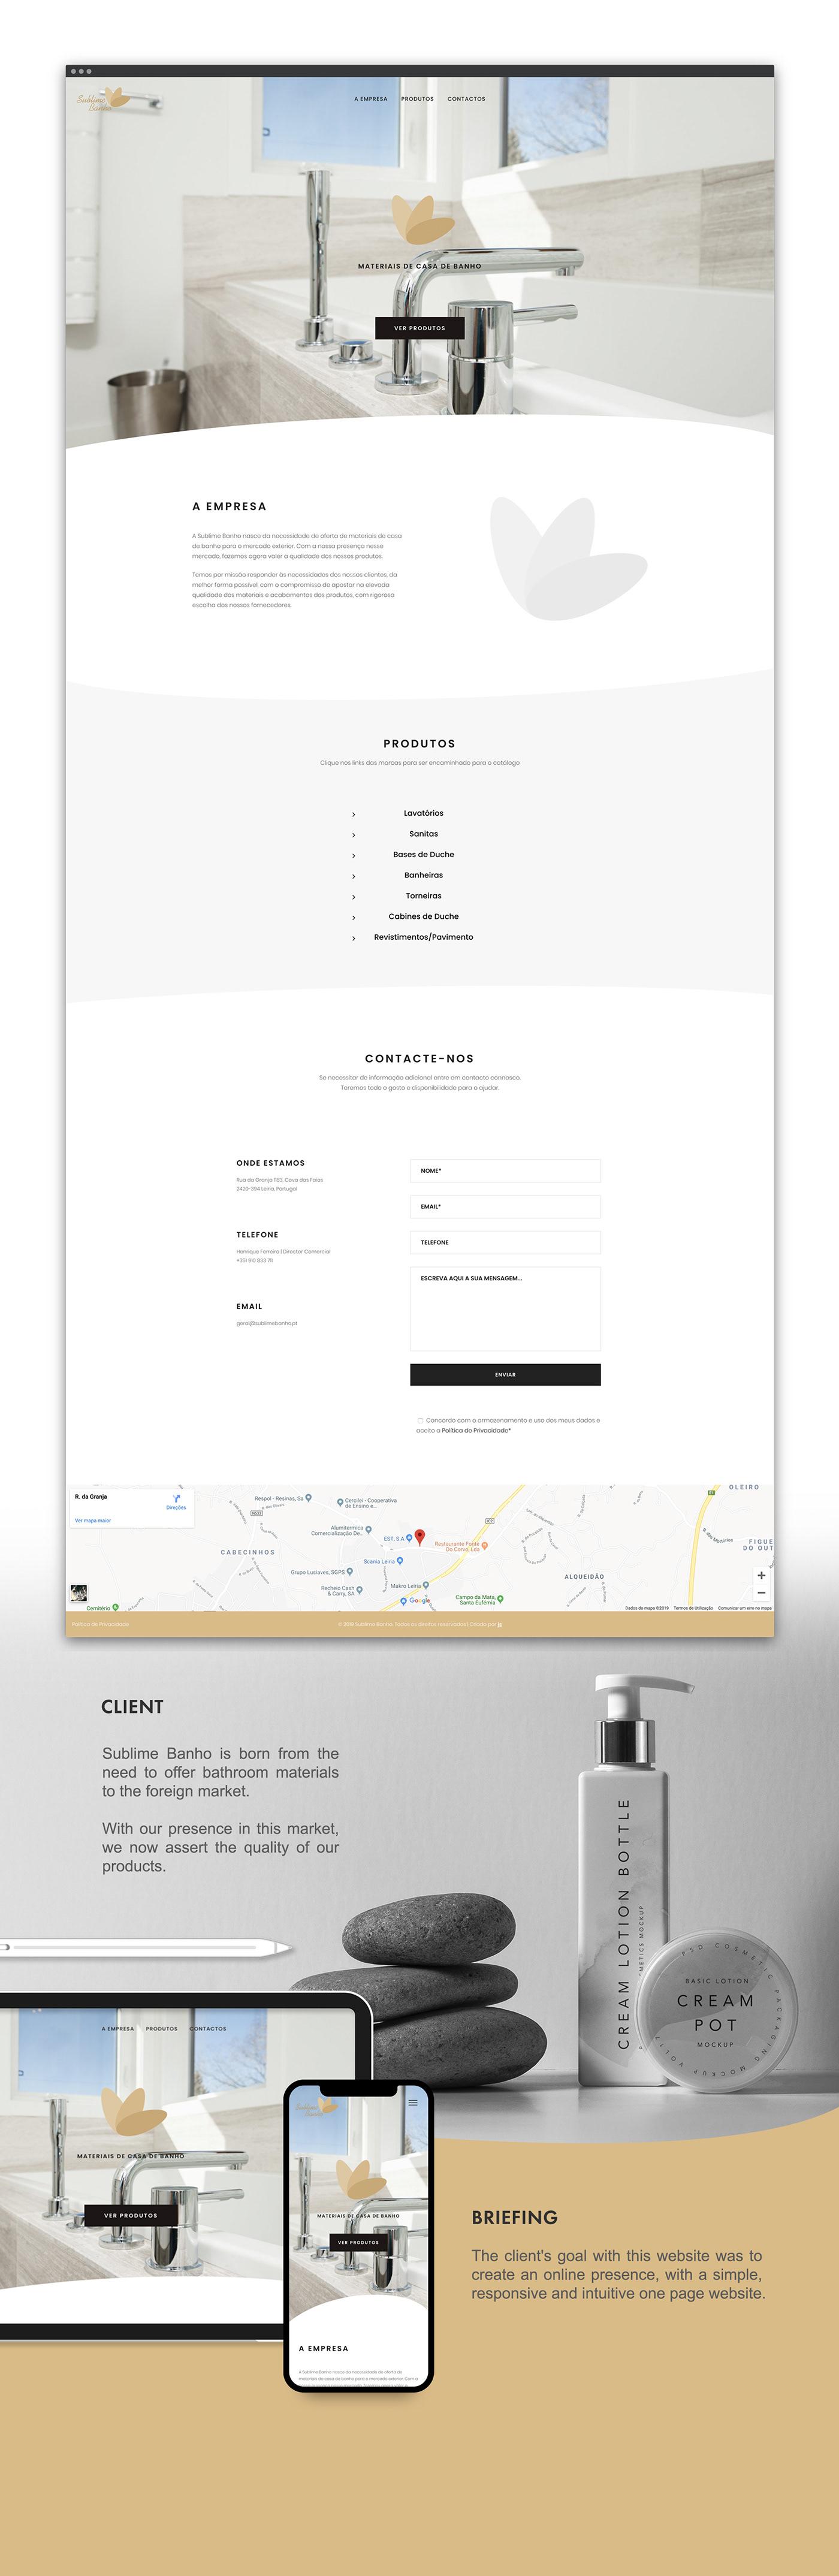 wordpress Web Design  development One Page cms Frontend Design bathroom materials